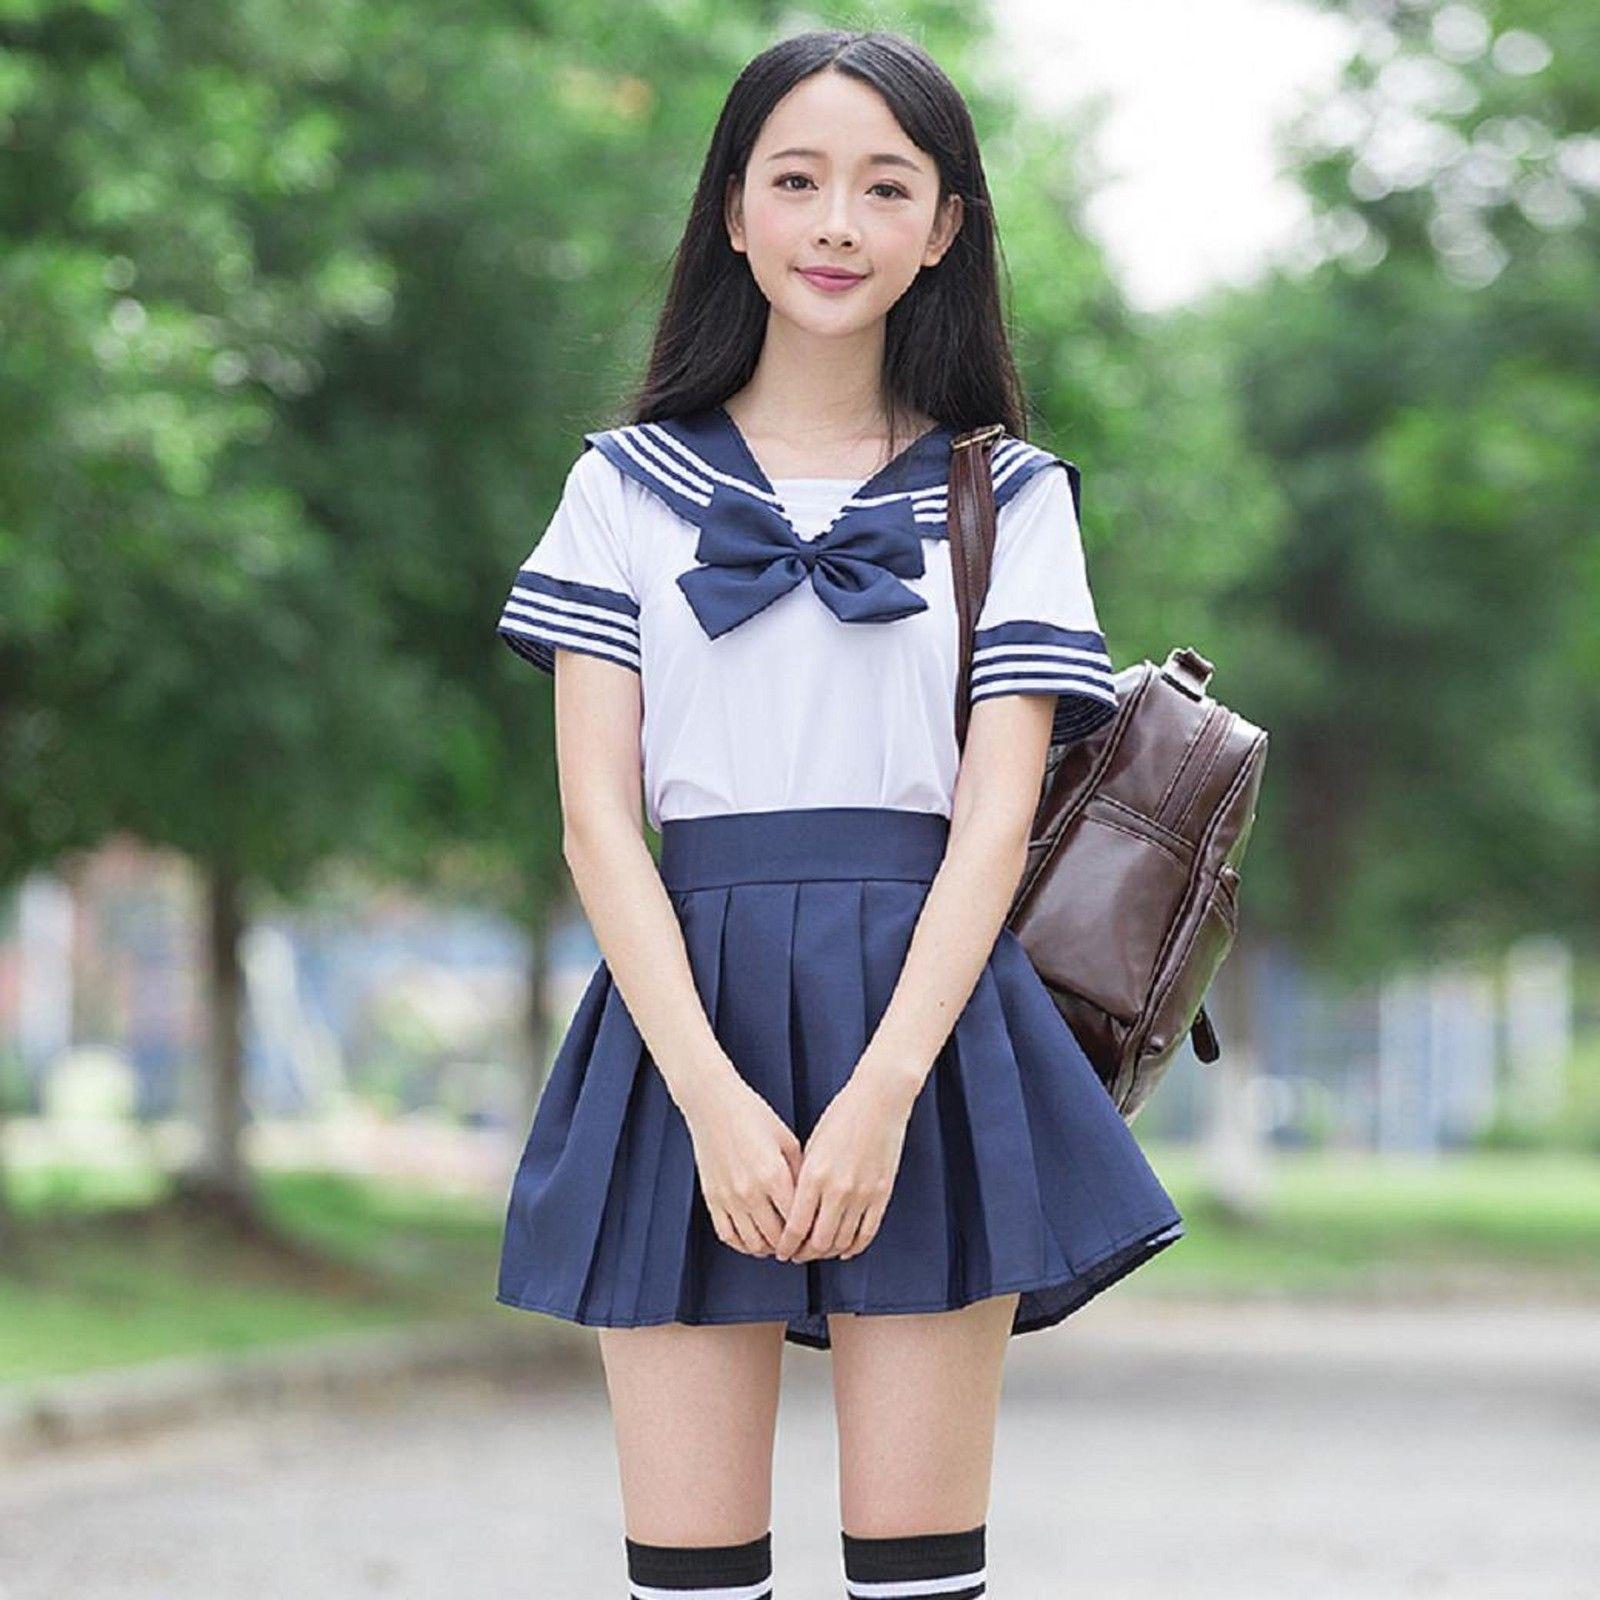 buy-japanese-school-girl-uniform-free-sex-galleries-nude-porn-videos